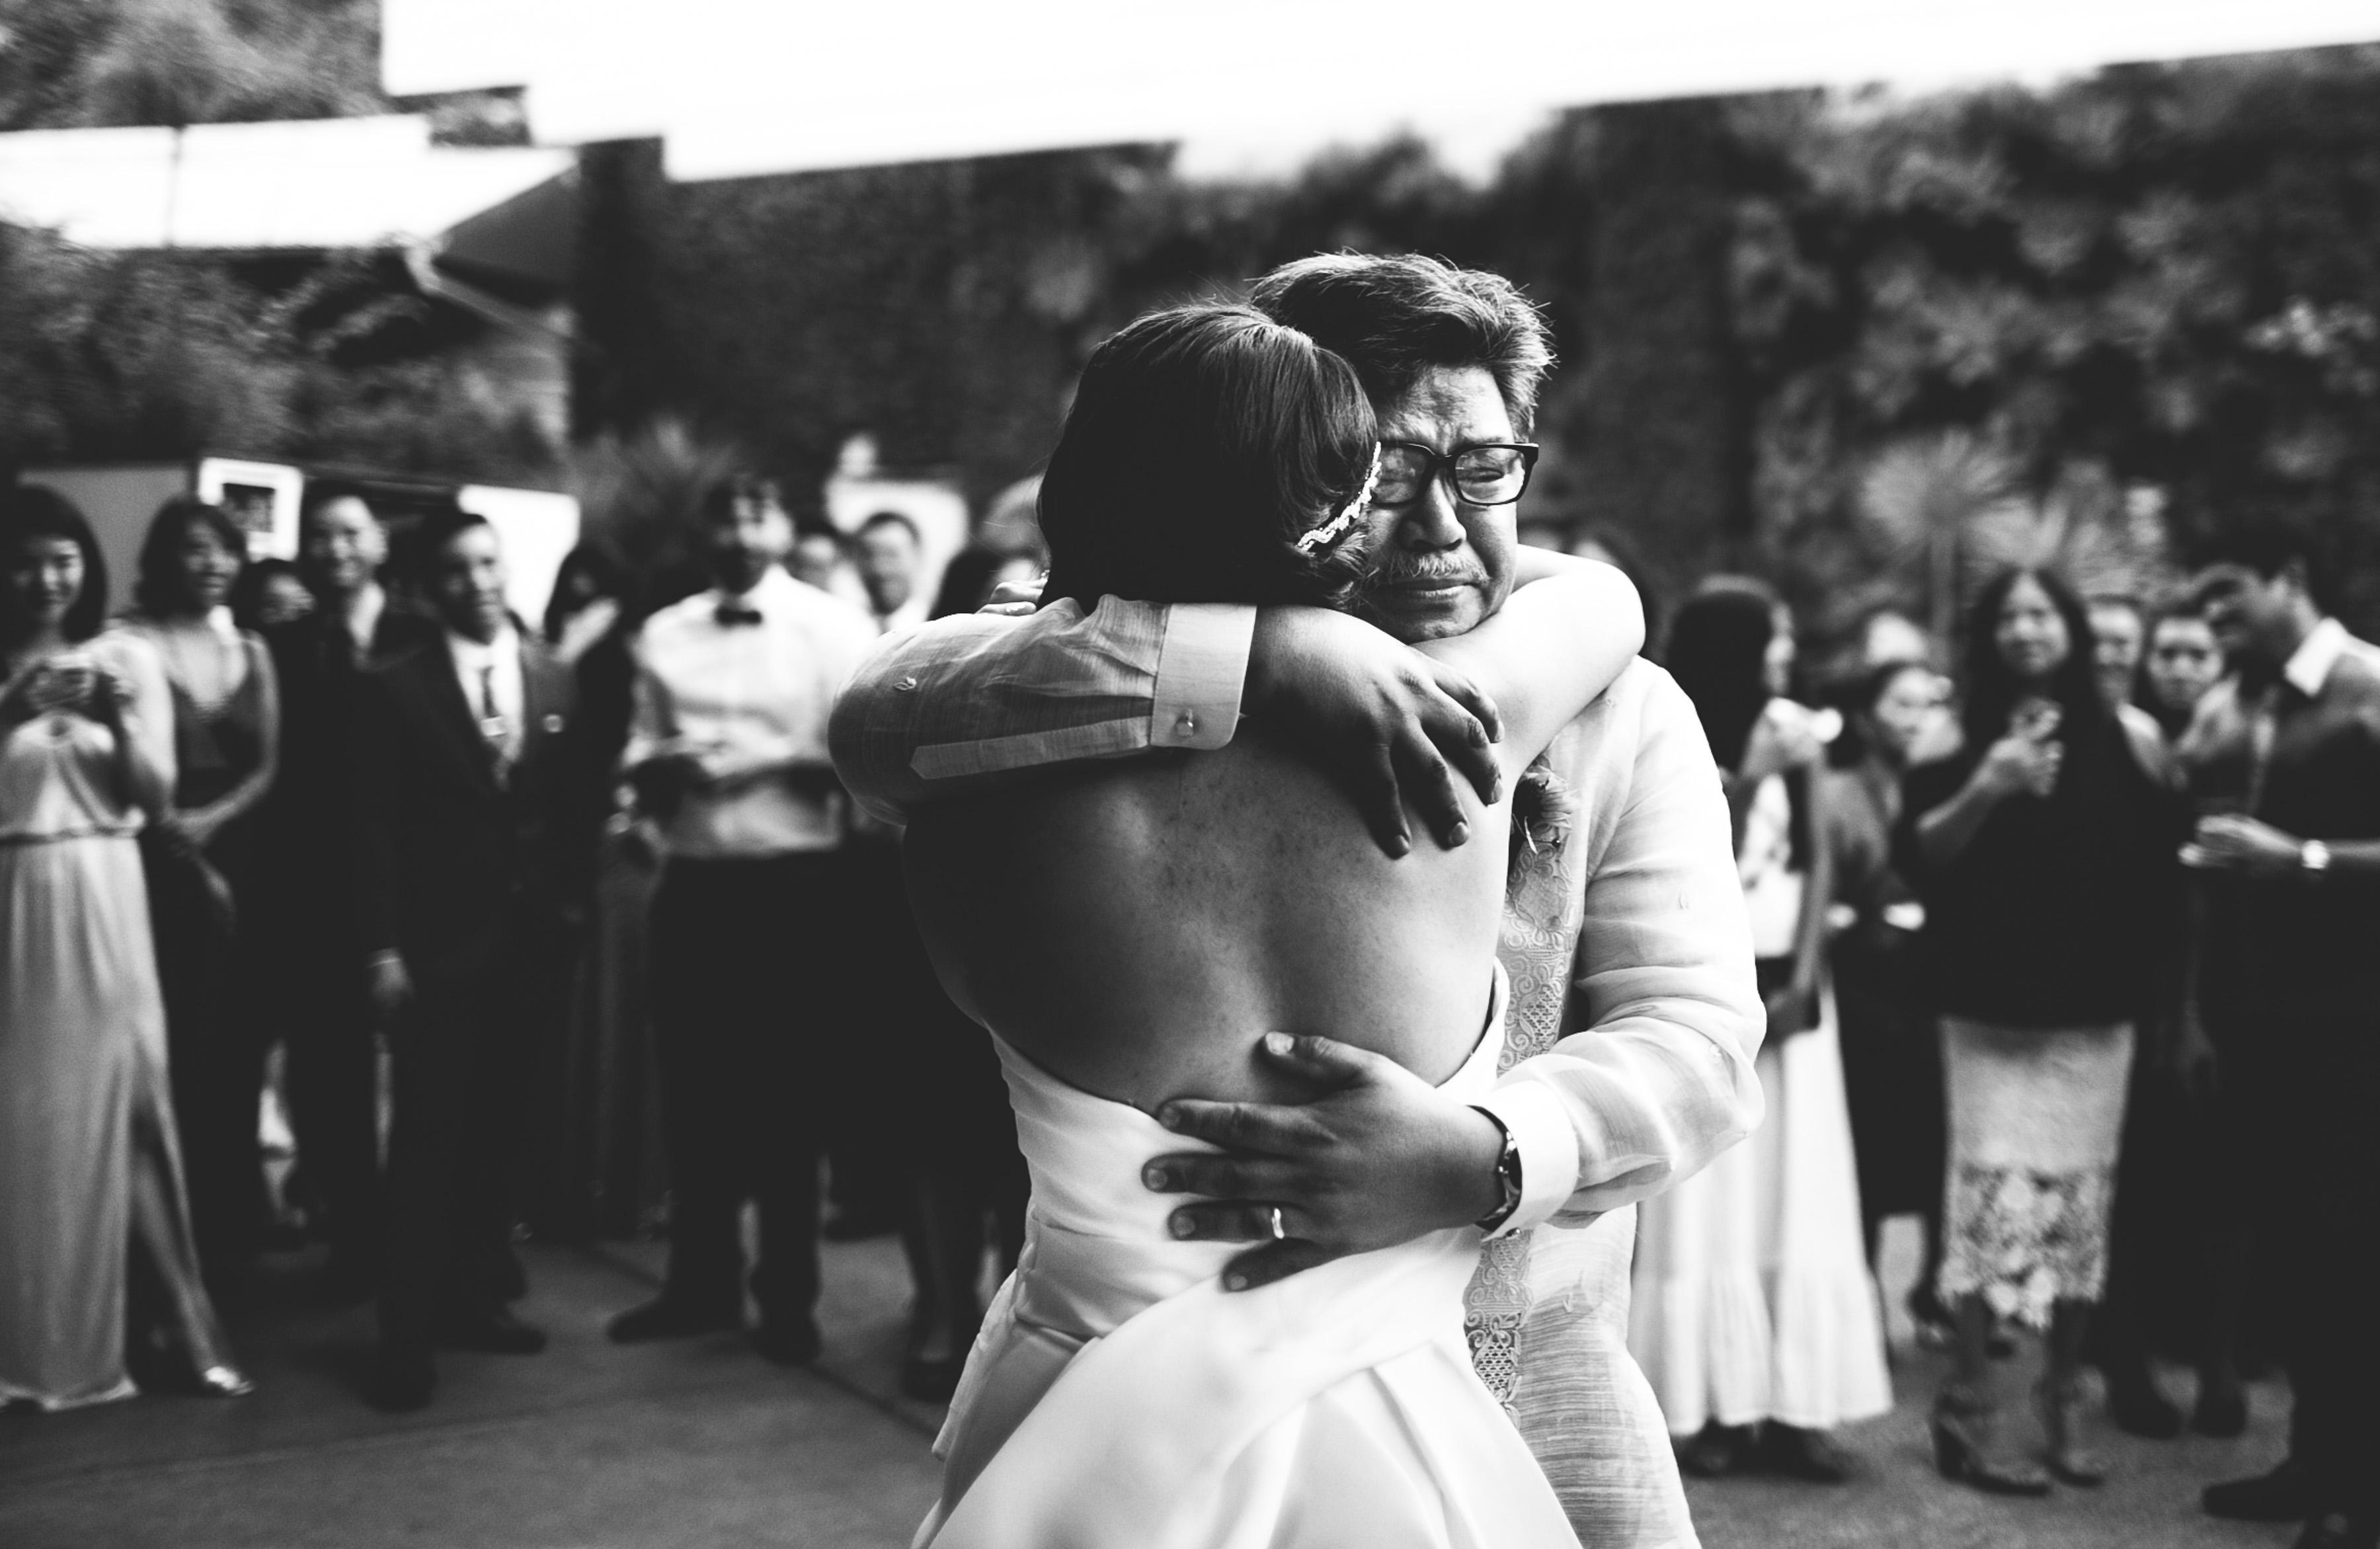 dad daughter wedding moment hug emotional